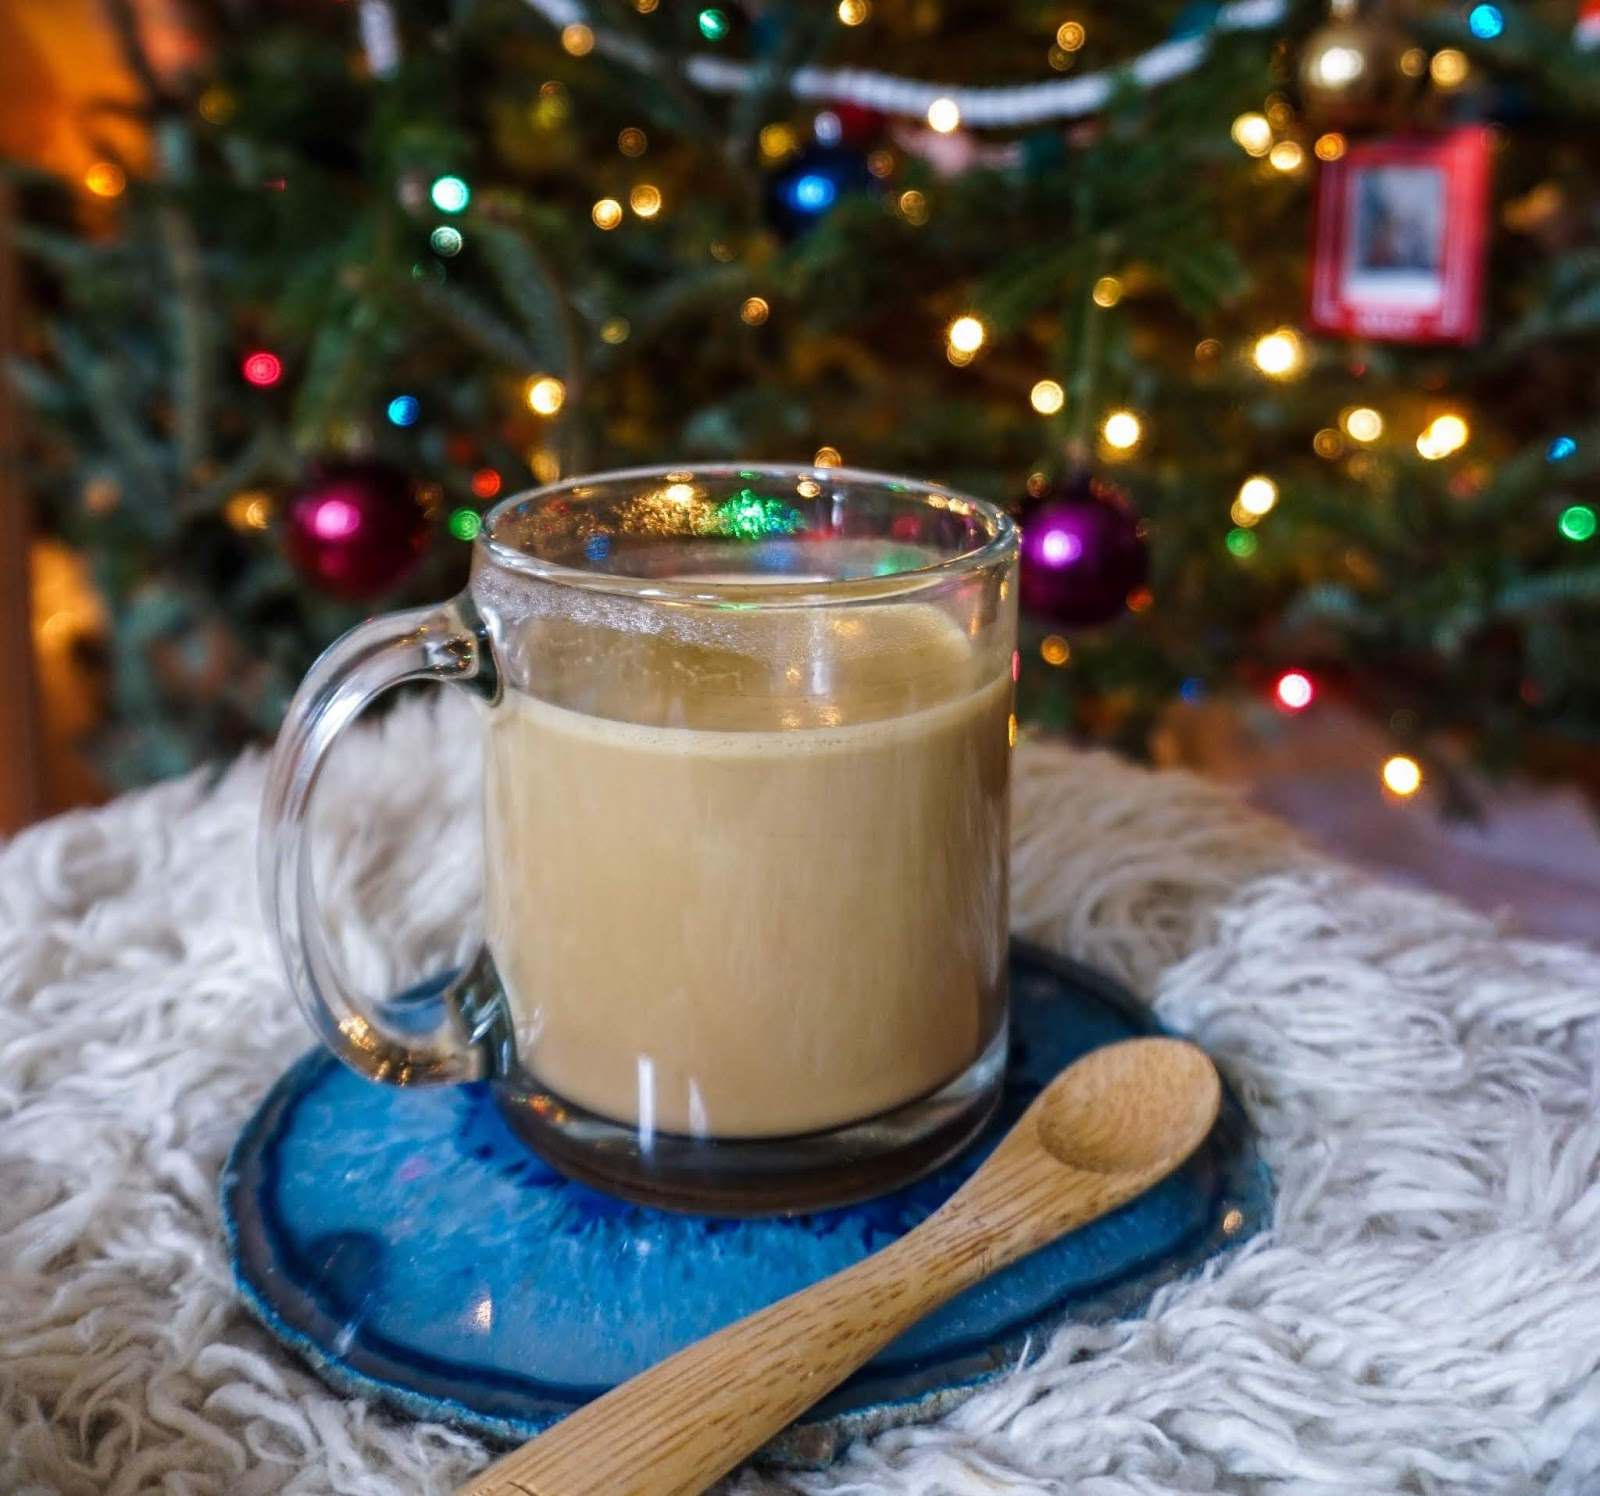 collagen hot cocoa recipe, paleo hot cocoa recipes, spicy hot chocolate, turmeric hot chocolate, healthy hot chocolate recipes, turmeric milk recipe, spiced hot chocolate, dairy-free hot chocolate, spiced milk, paleo spiced milk recipe, turmeric and collagen spiced milk